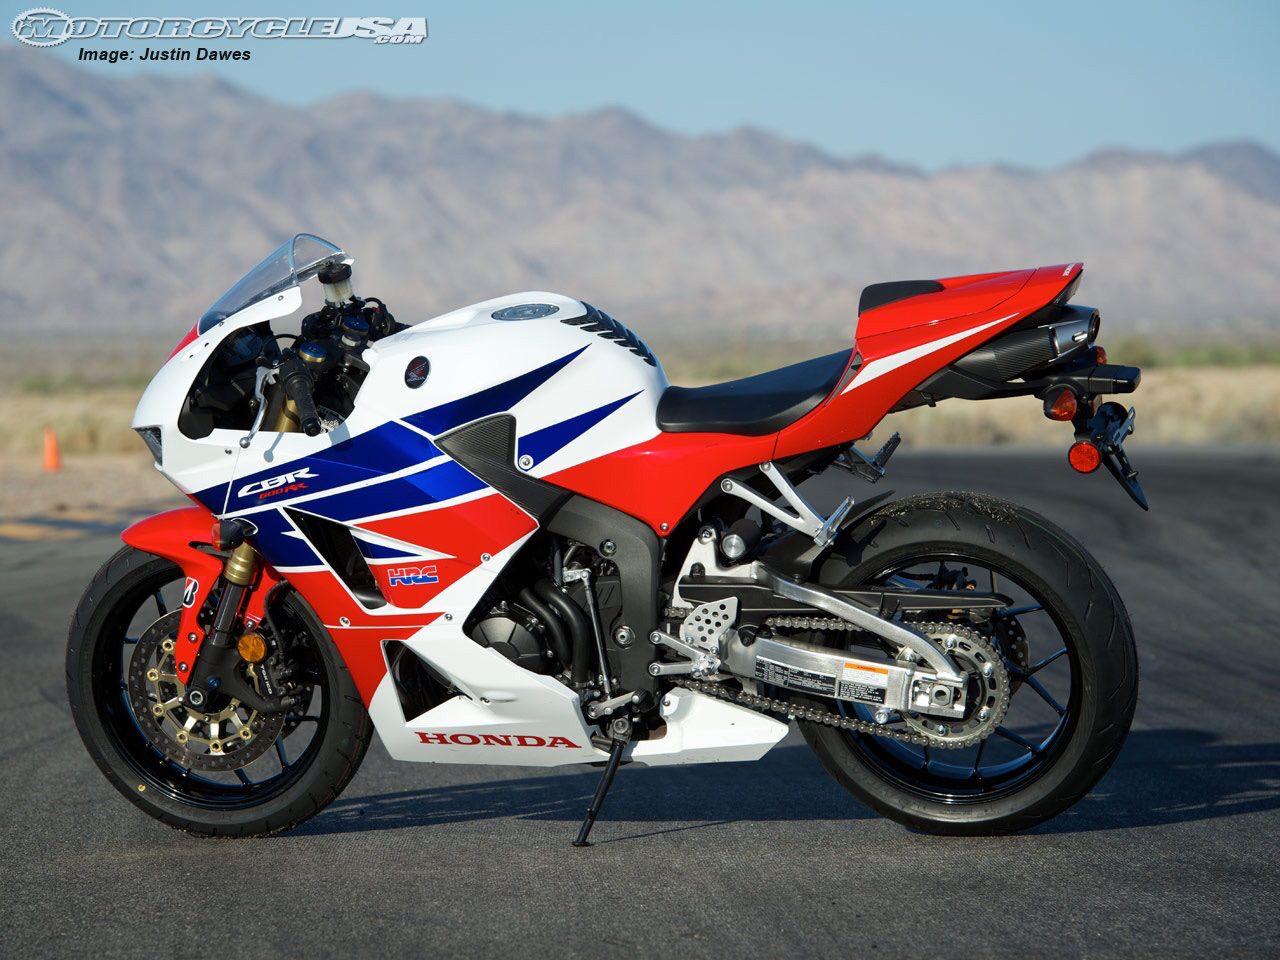 Honda CBR 600RR in America Scheme Honda cbr600rr, Honda